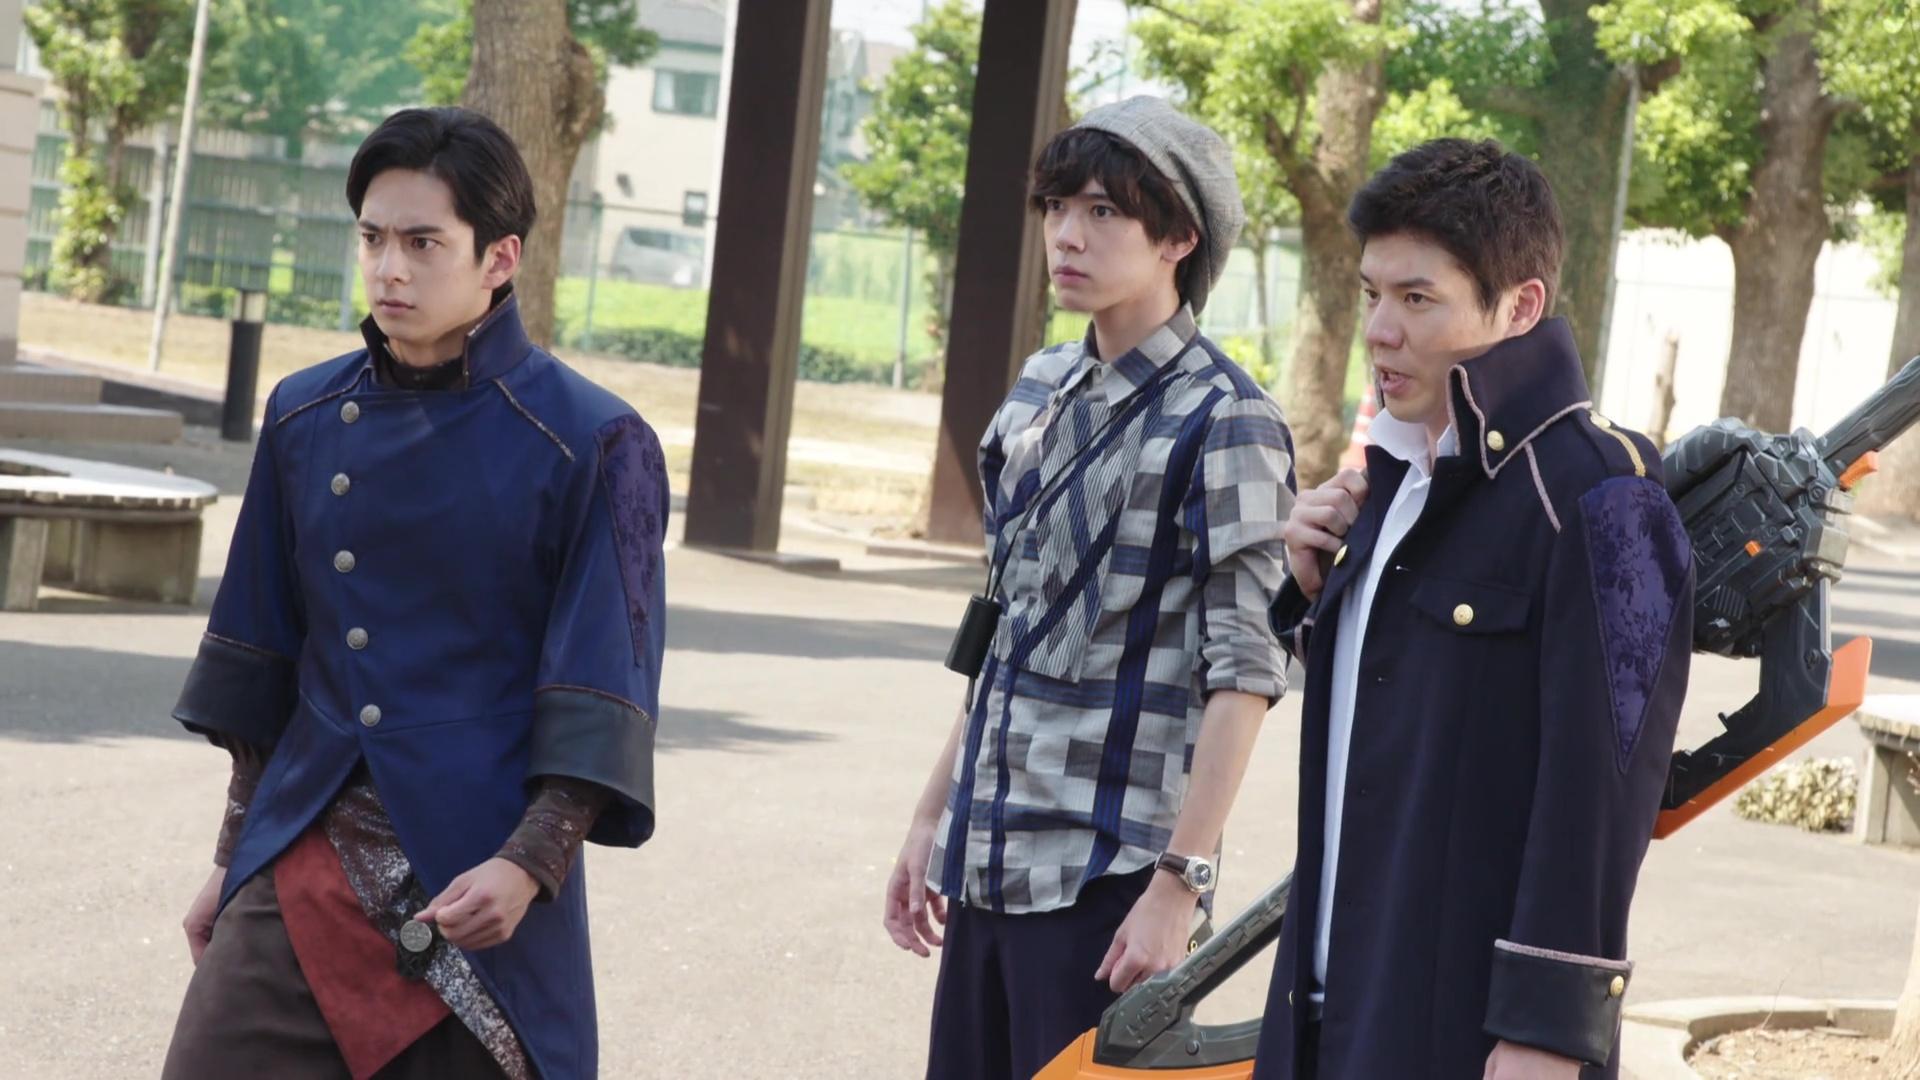 Kamen Rider Saber Episode 4 Recap